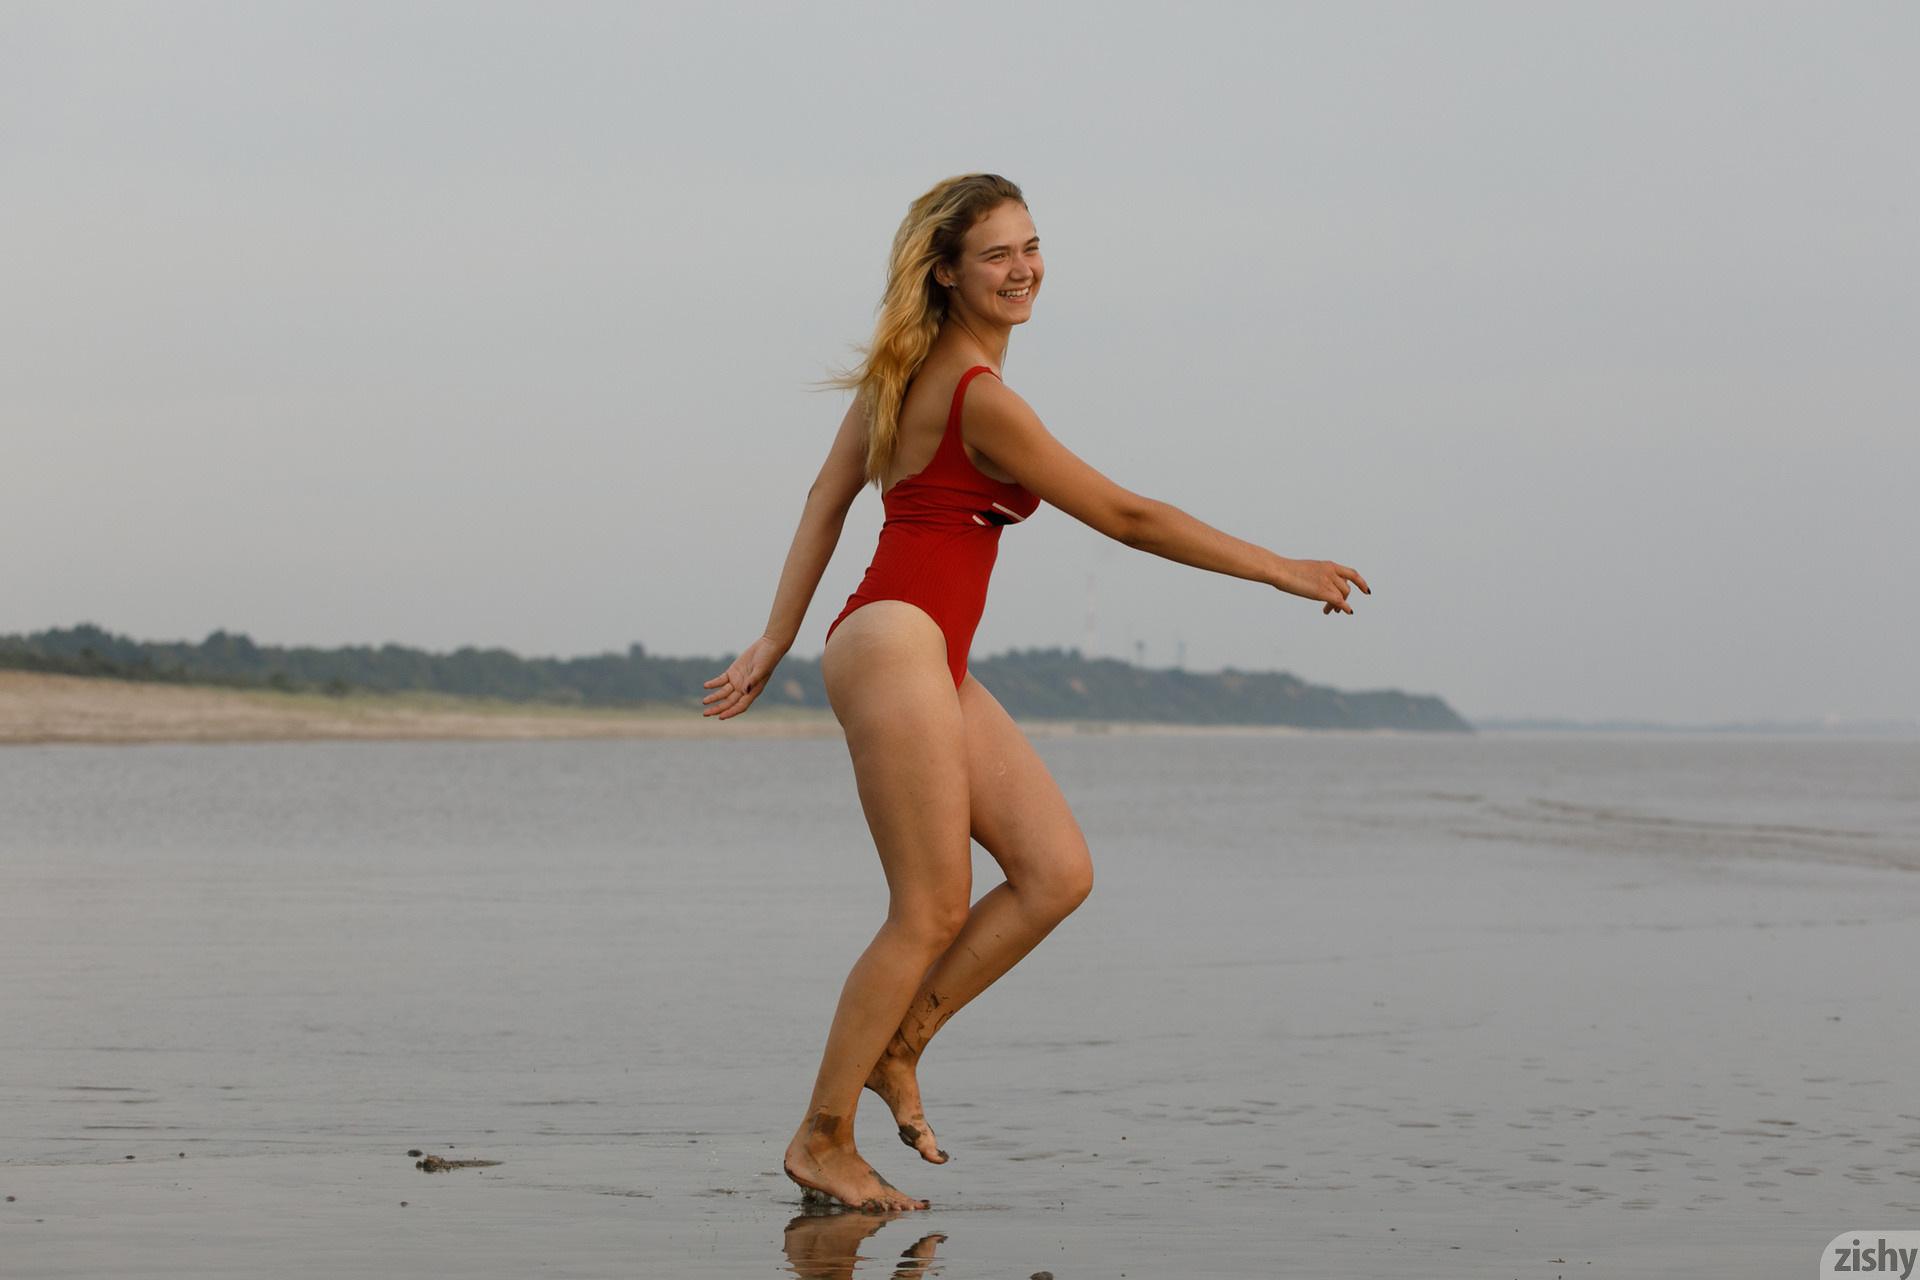 Sofia Orlova On Gryaznyy Beach Zishy (3)